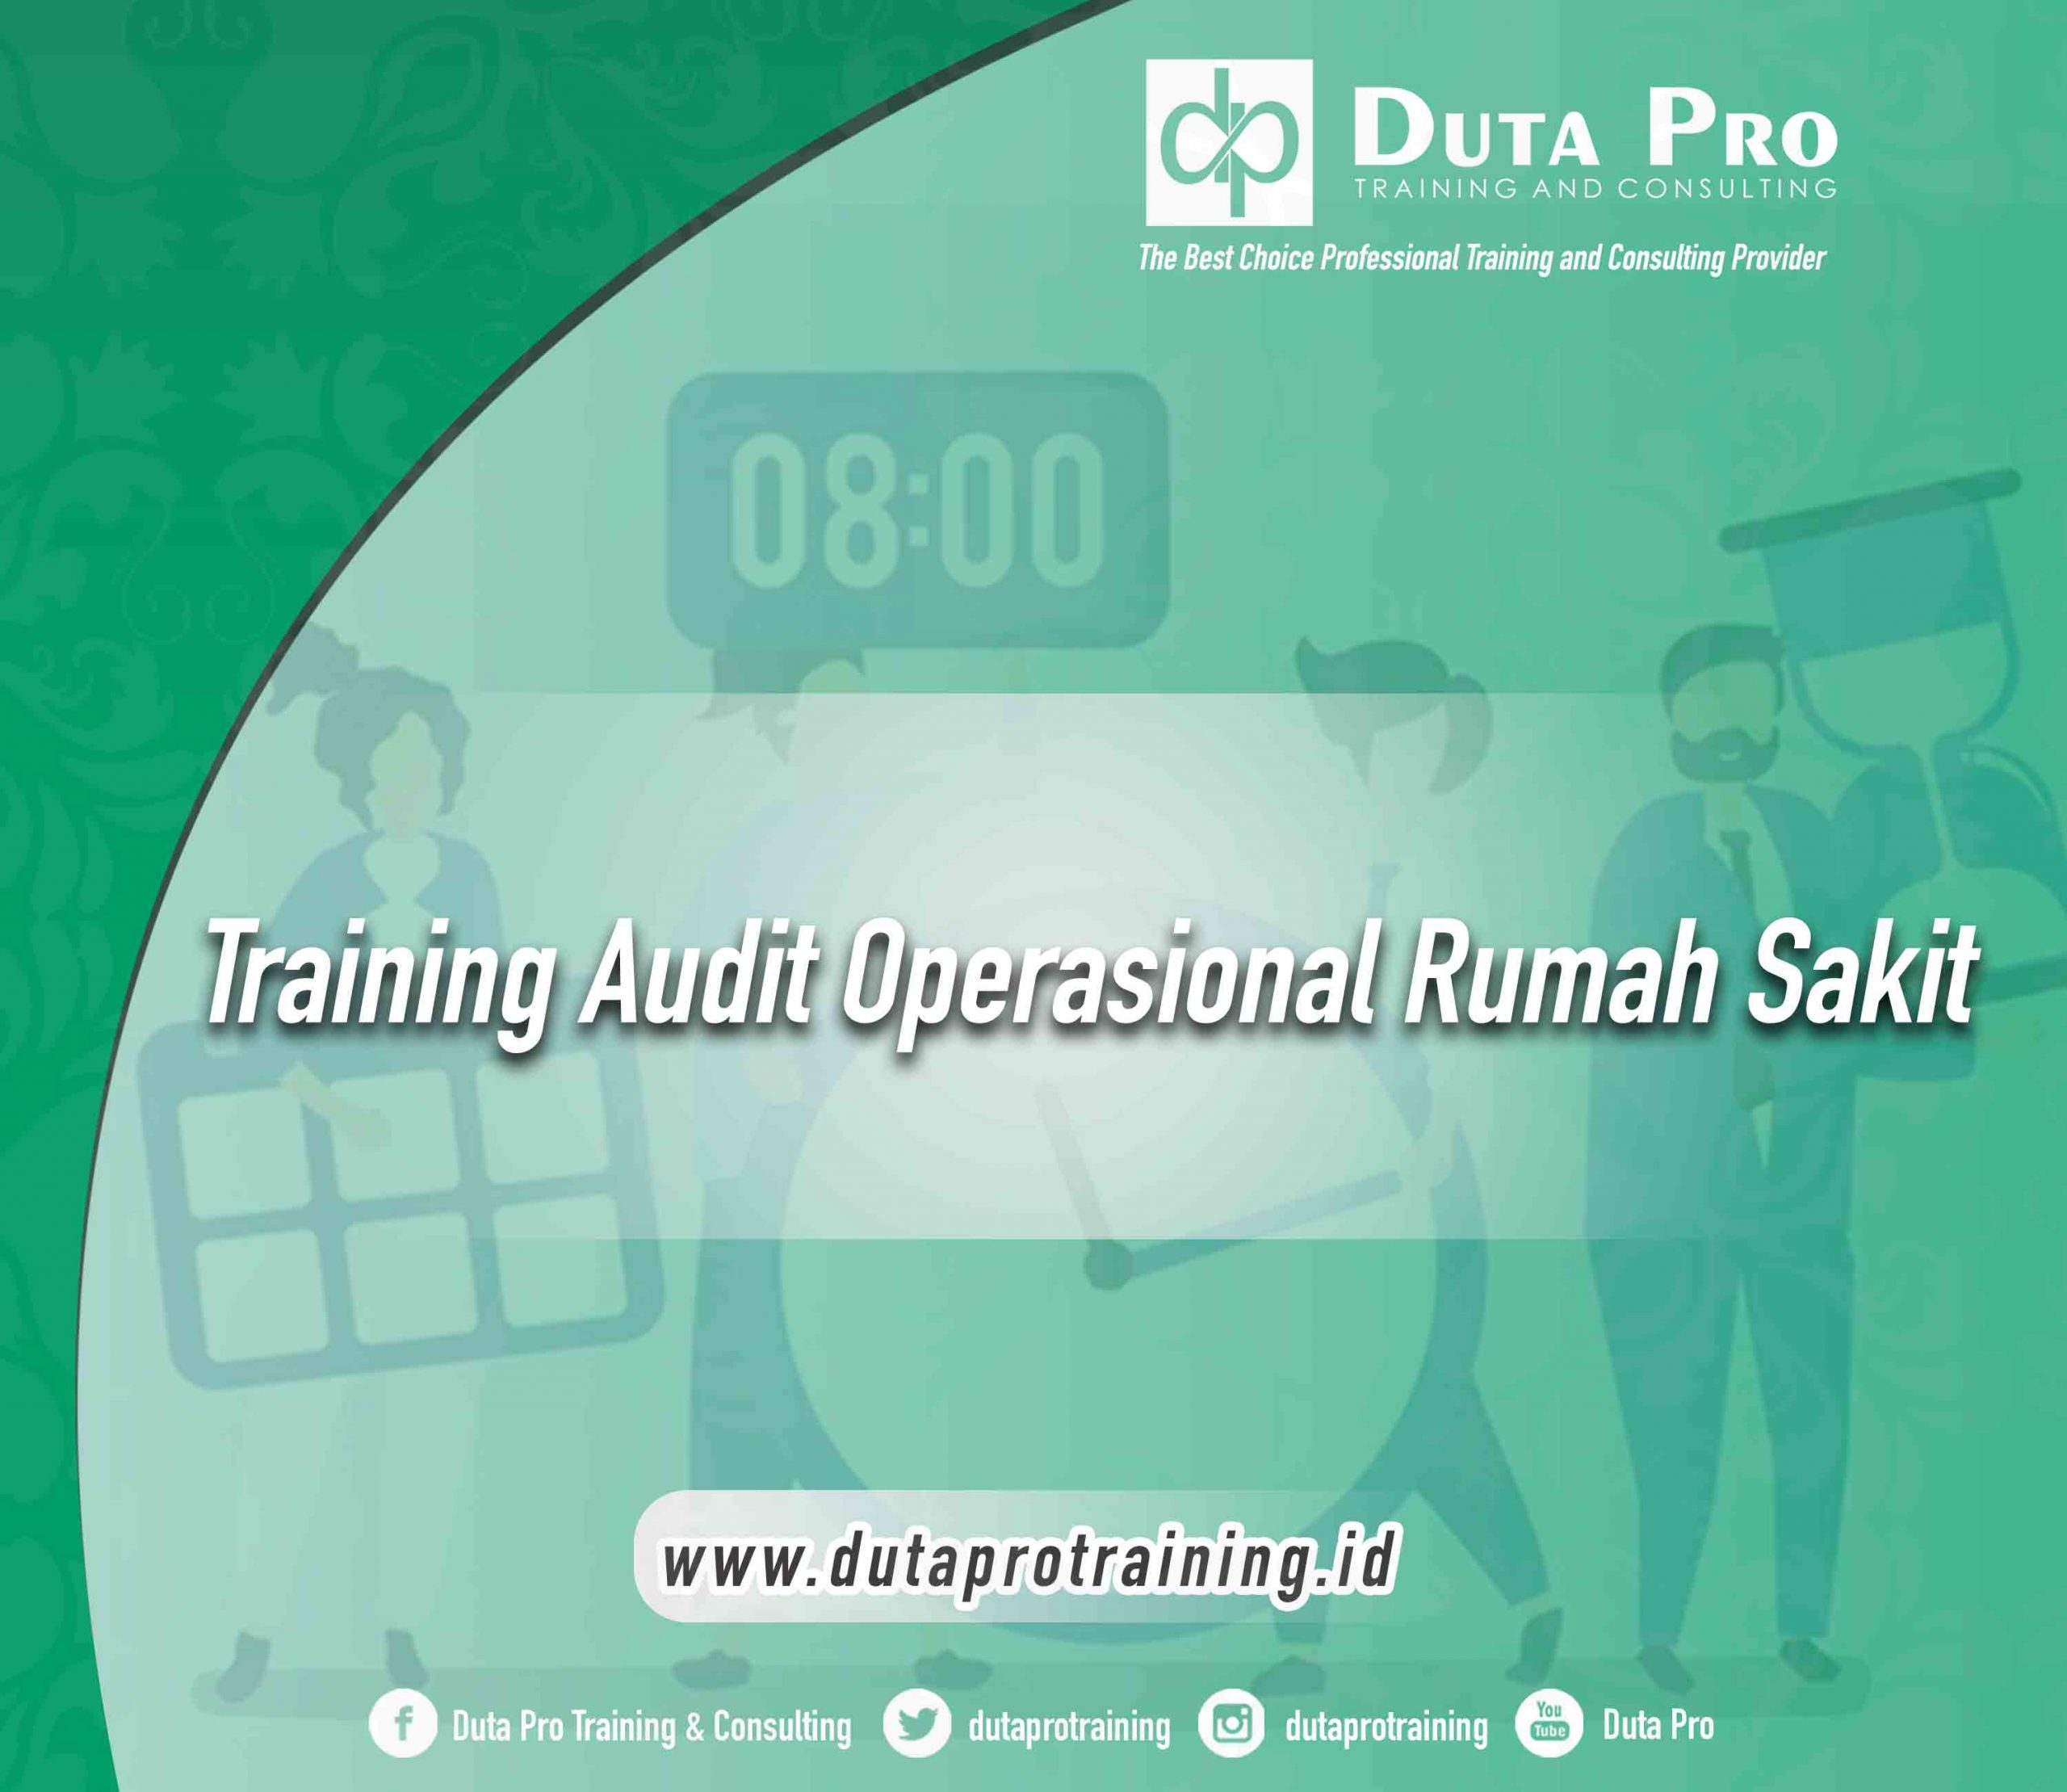 Training Audit Operasional Rumah Sakit